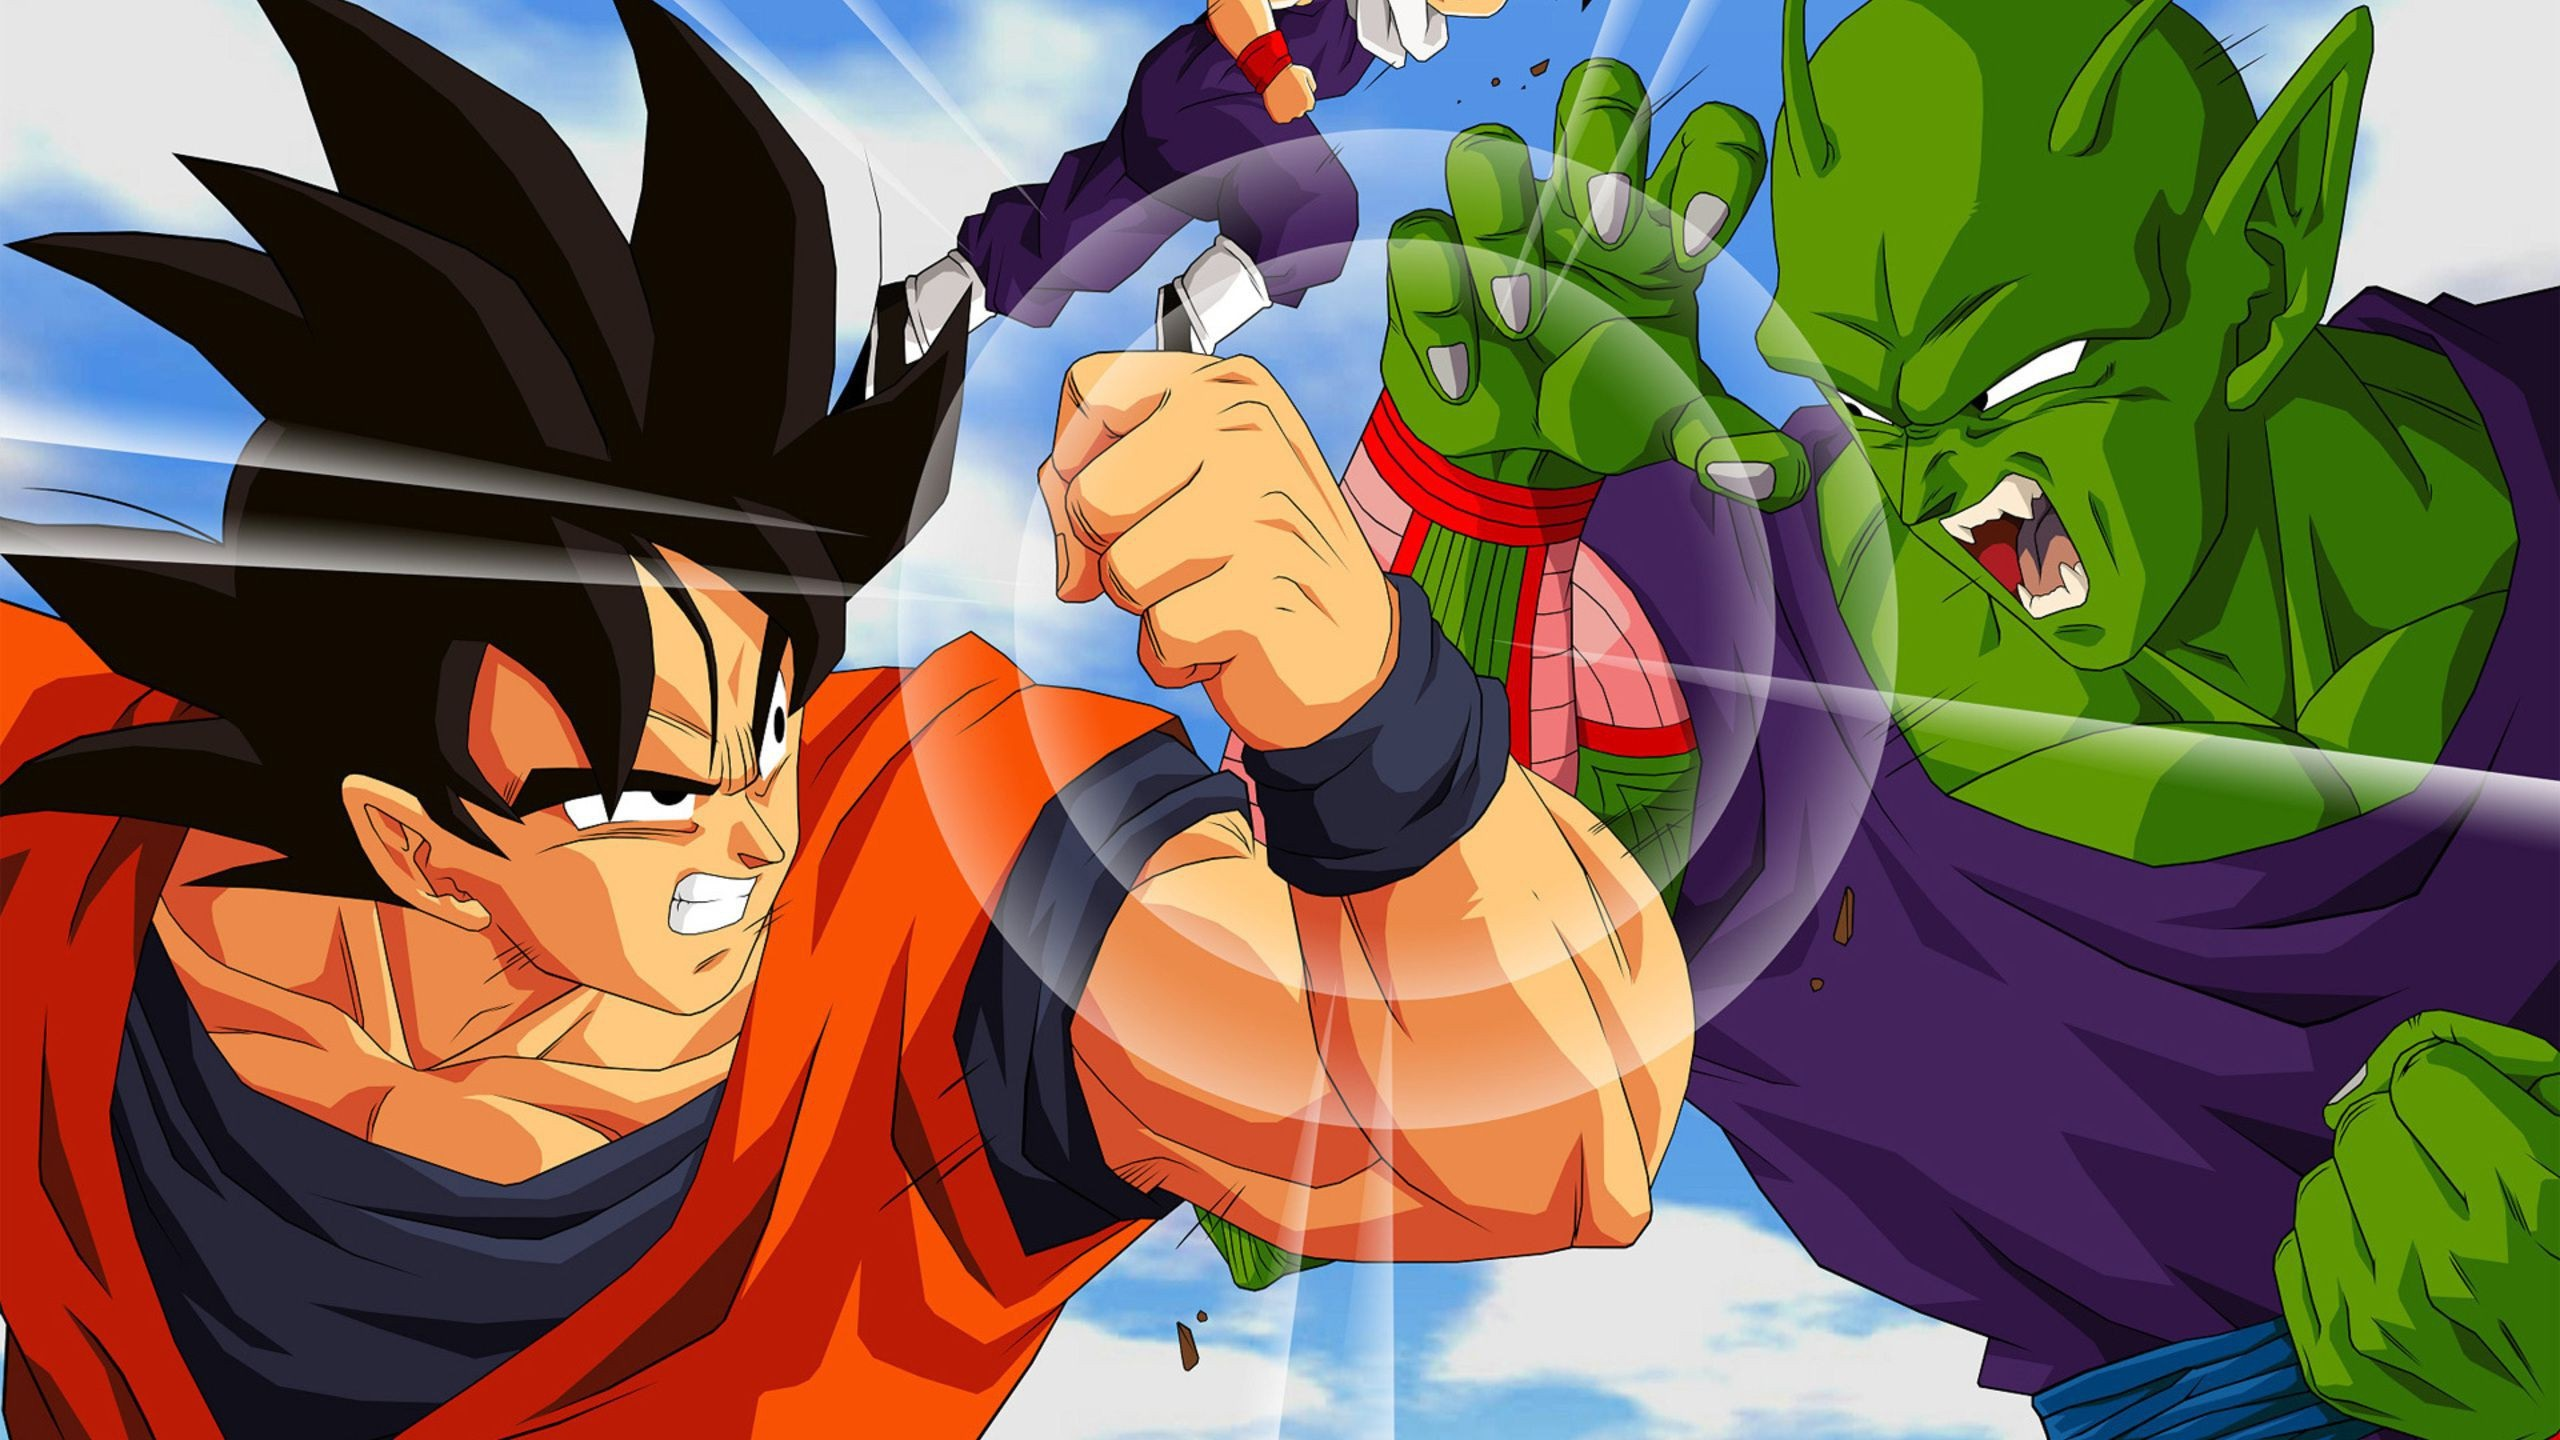 Dragon Ball Z Piccolo Vs Goku 1546127 Hd Wallpaper Backgrounds Download